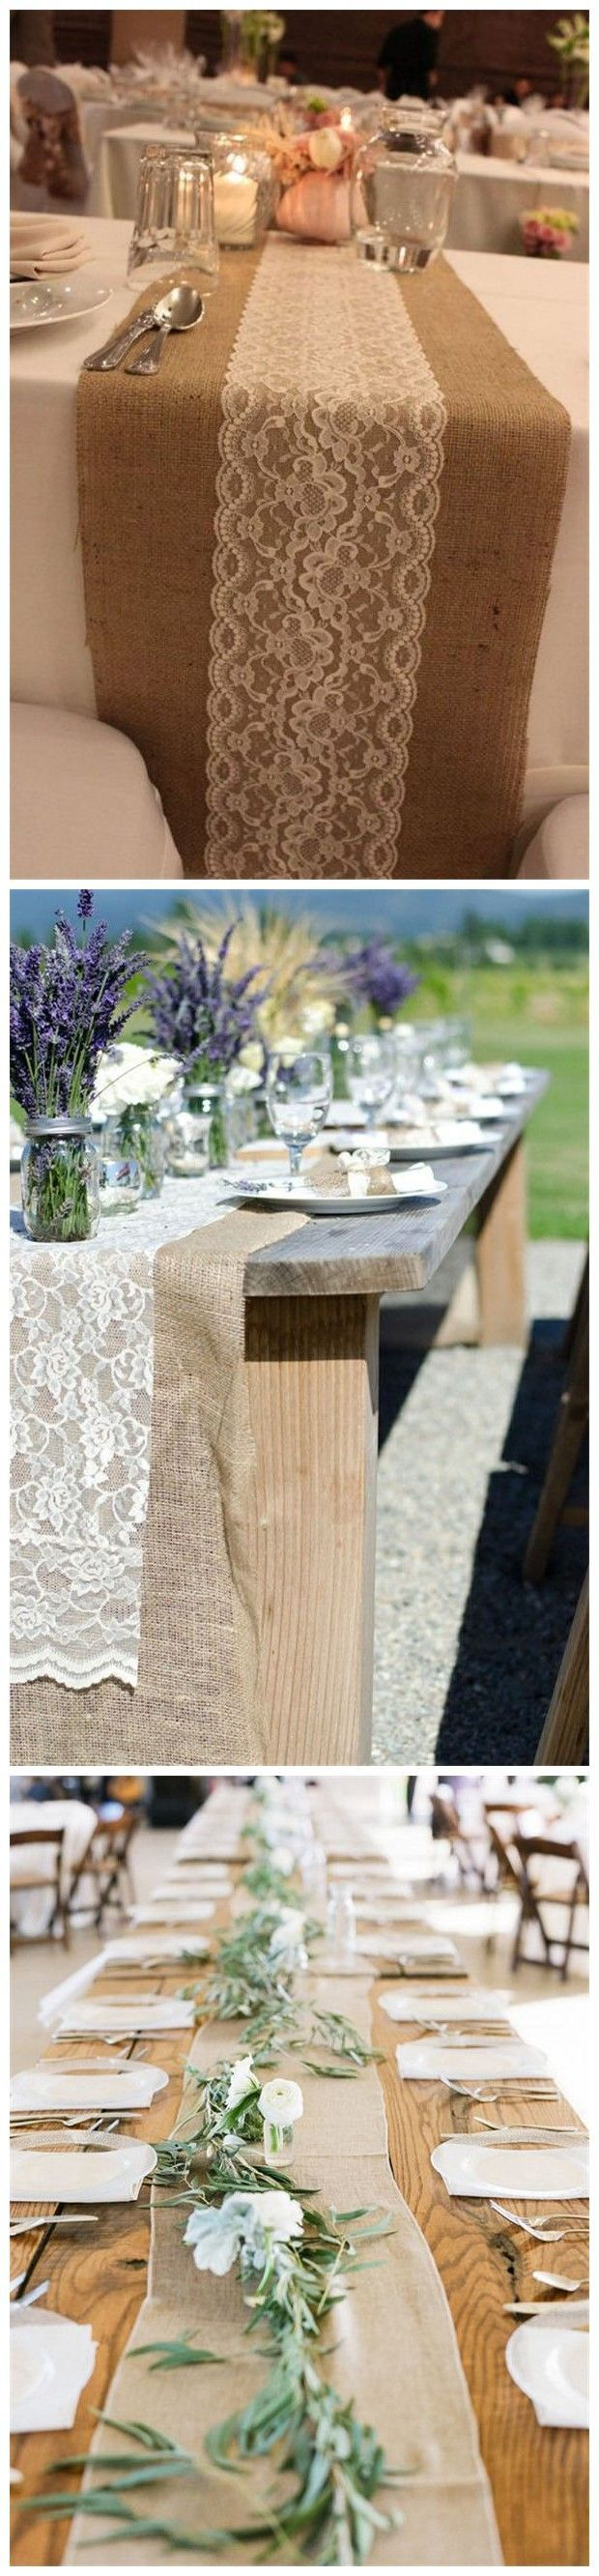 Best 25 burlap wedding tables ideas on pinterest burlap for Table runner ideas